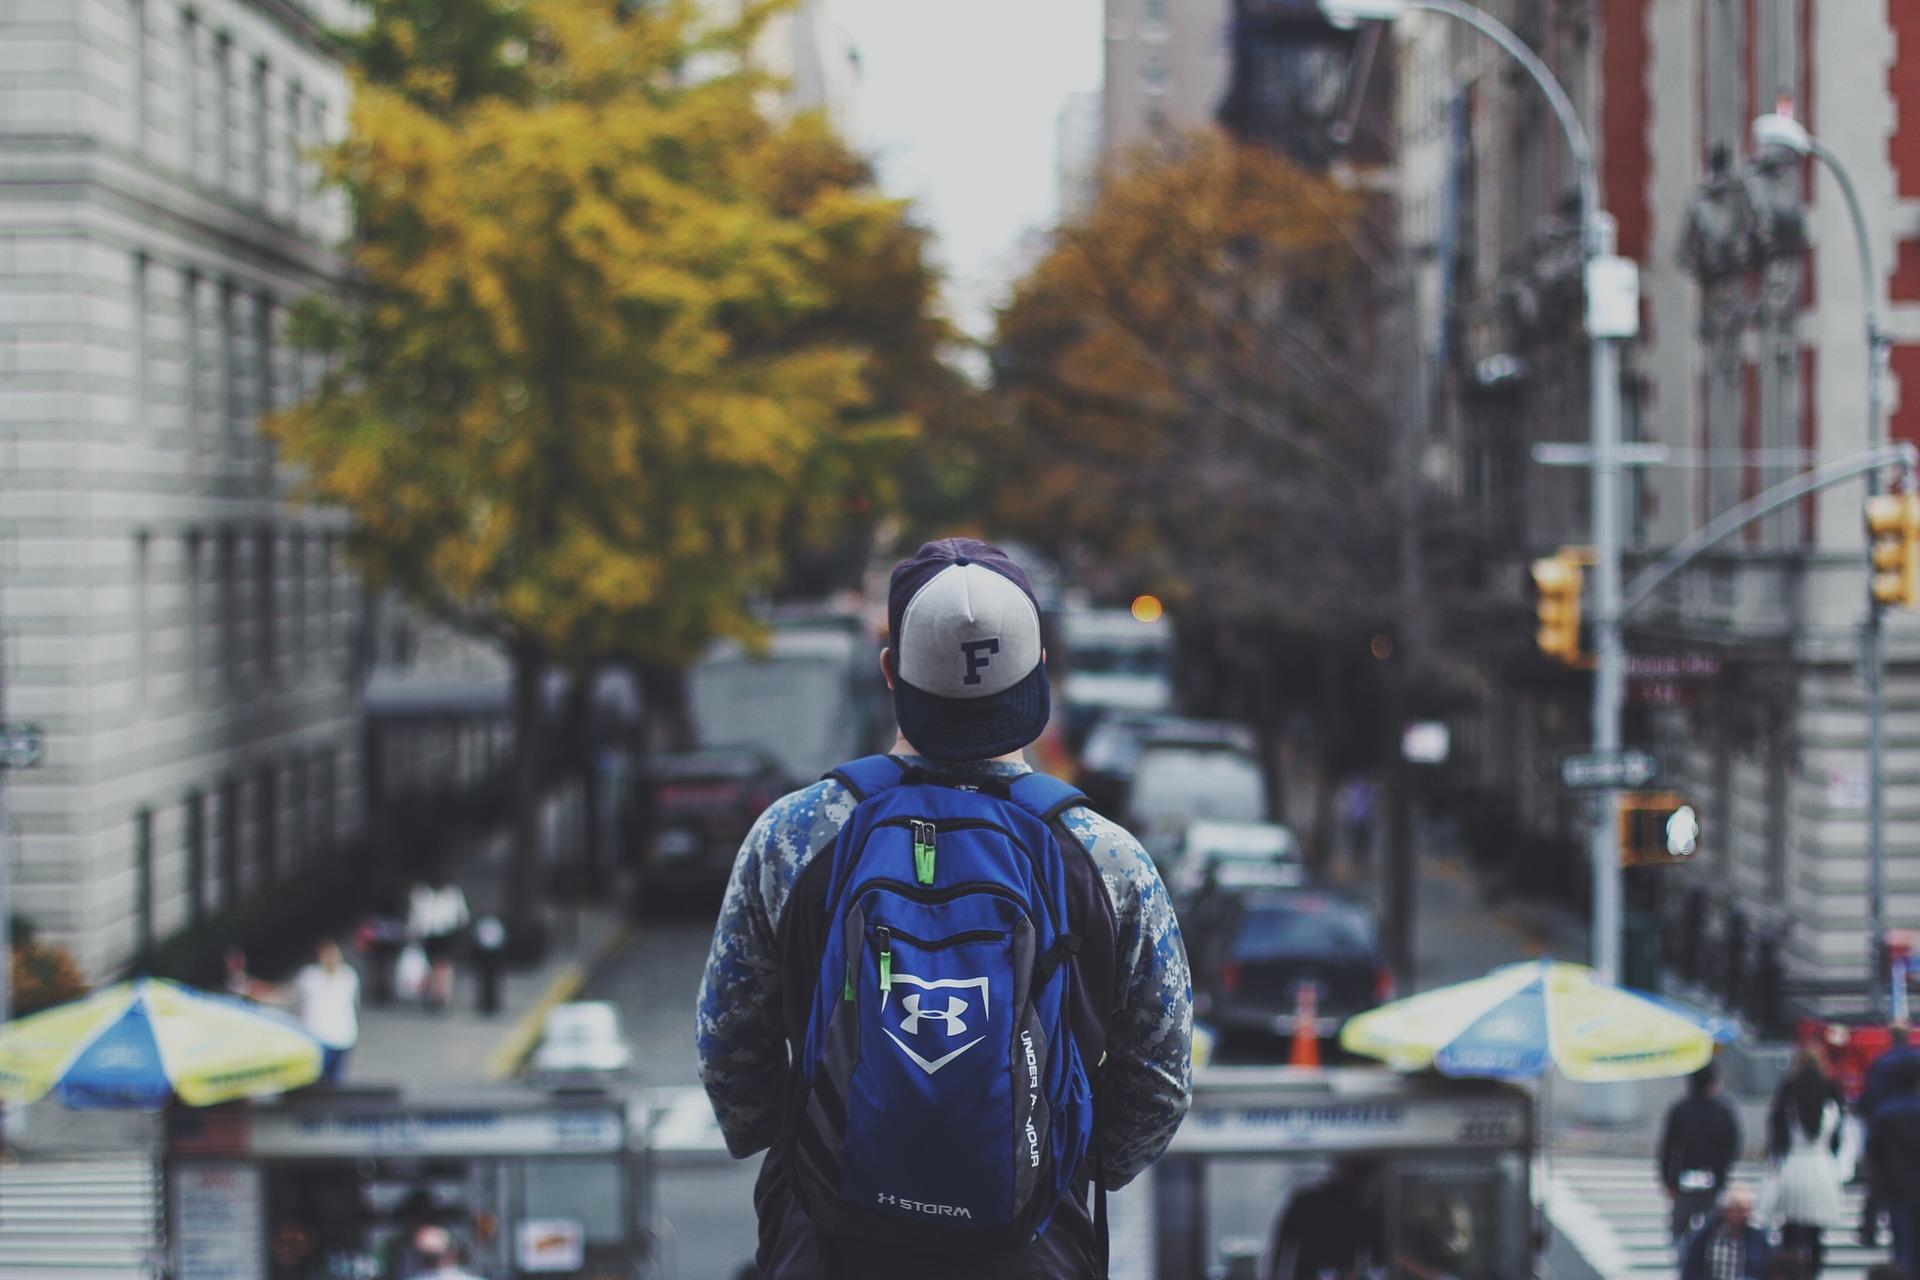 backpack-1149462_1920.jpg